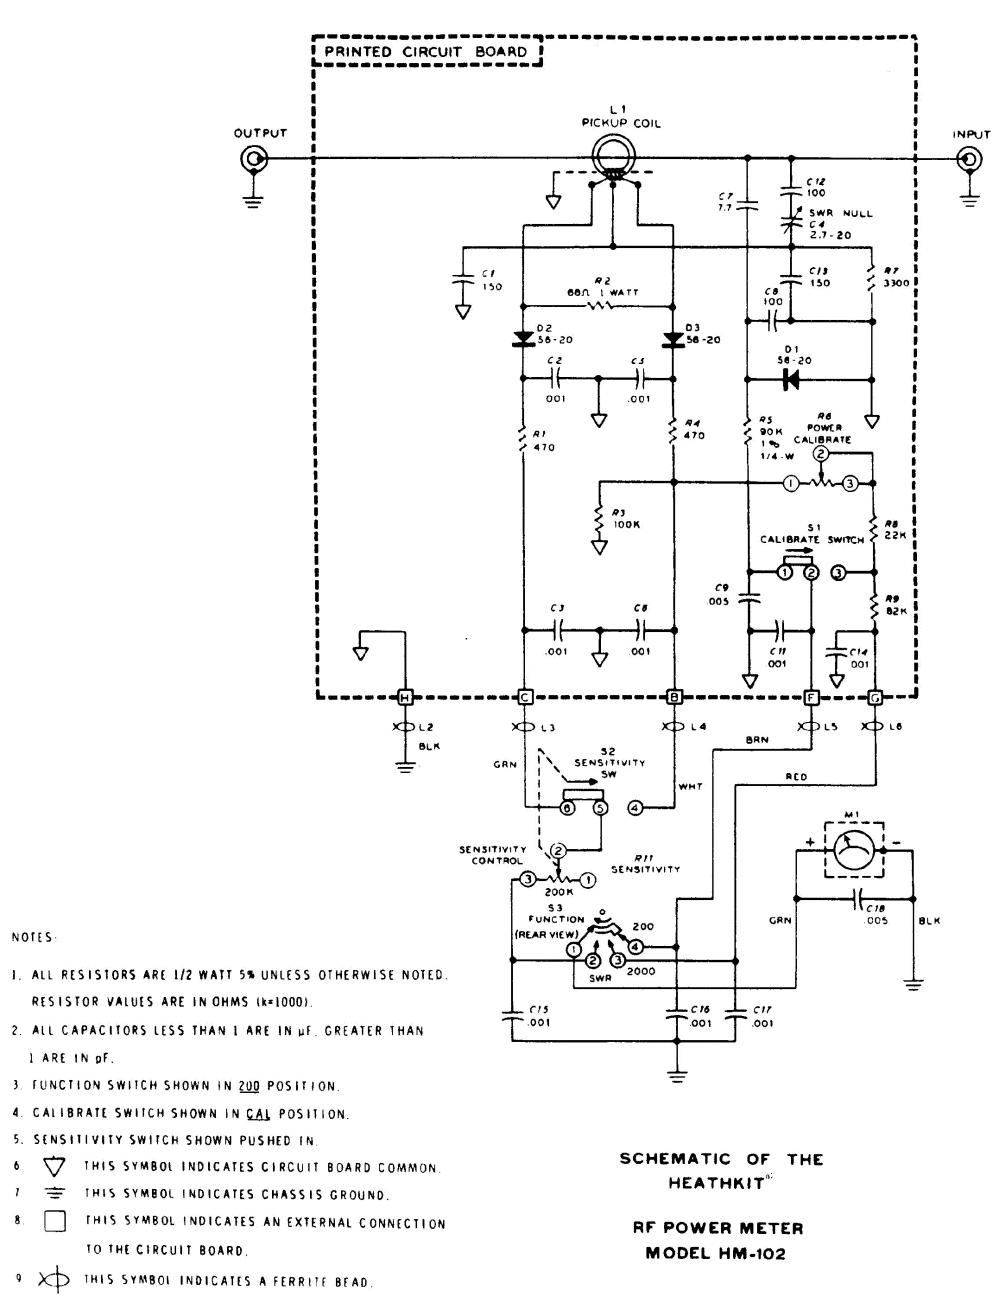 medium resolution of heathkit hm 102 rf power meter sm service manual 1st page